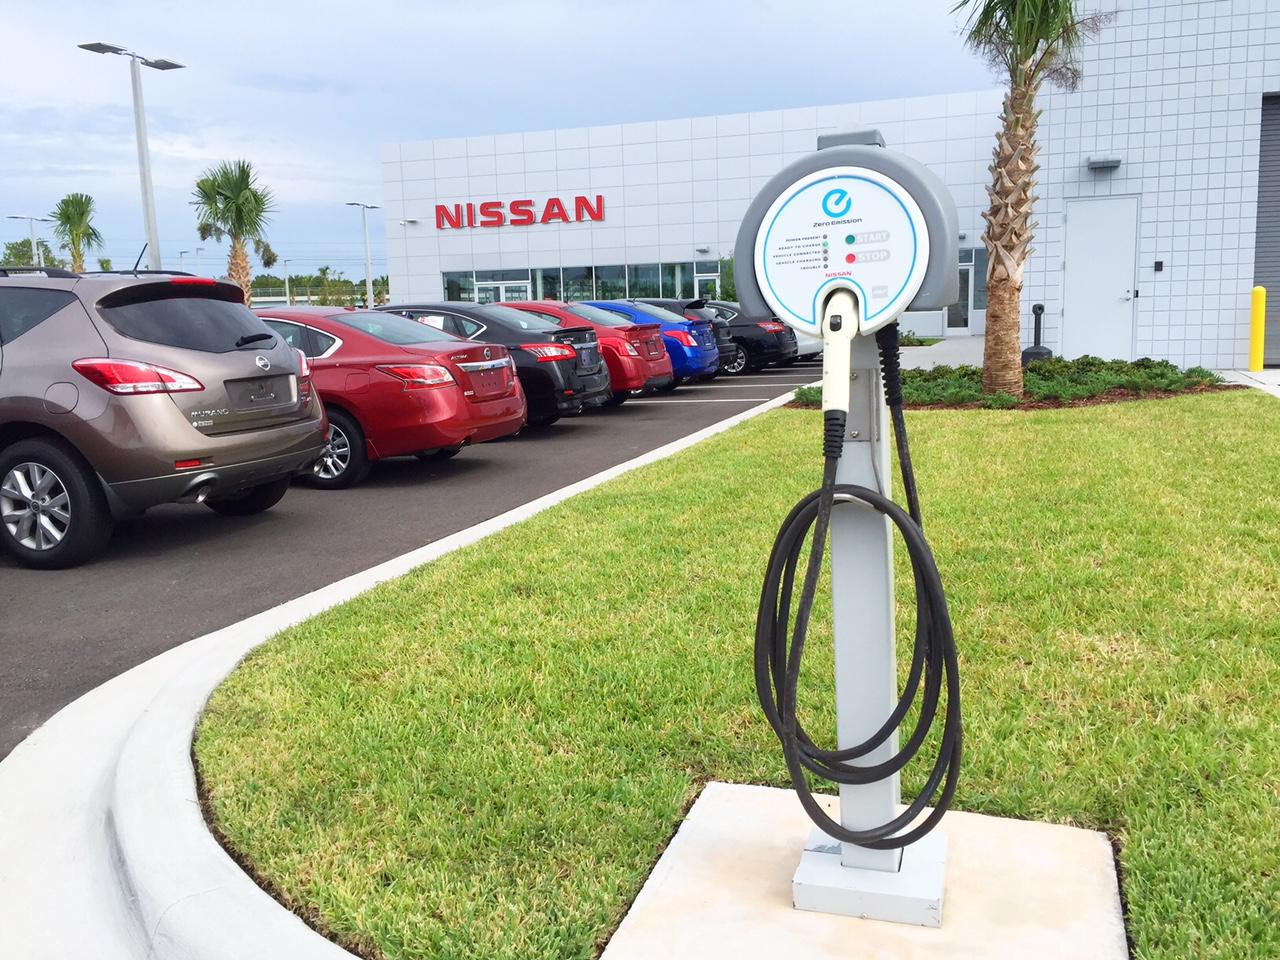 Daytona Nissan - Free DC Fast Electric Car Charging - 93 Check-ins ...